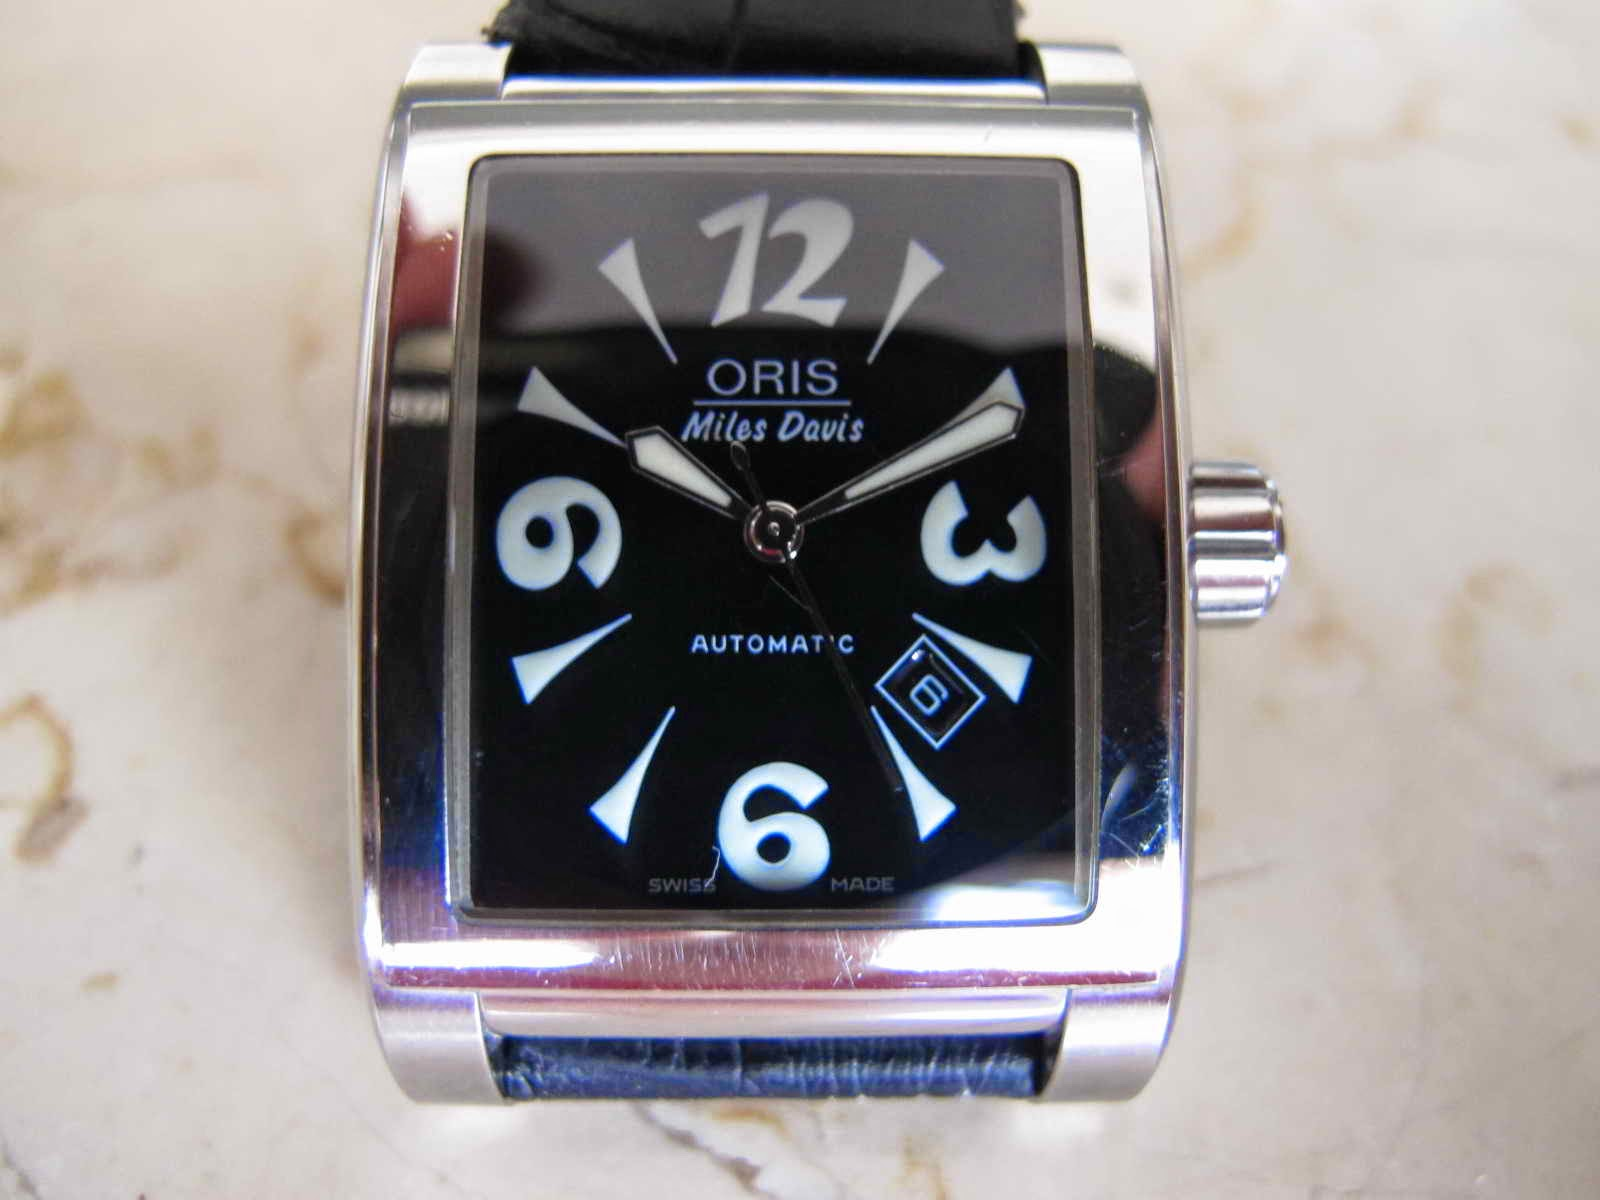 Cocok untuk Anda yang sedang mencari jam tangan dengan bentuk kotak TV Shape Swiss Made dan Limited Edition ORIS MILES DAVIS